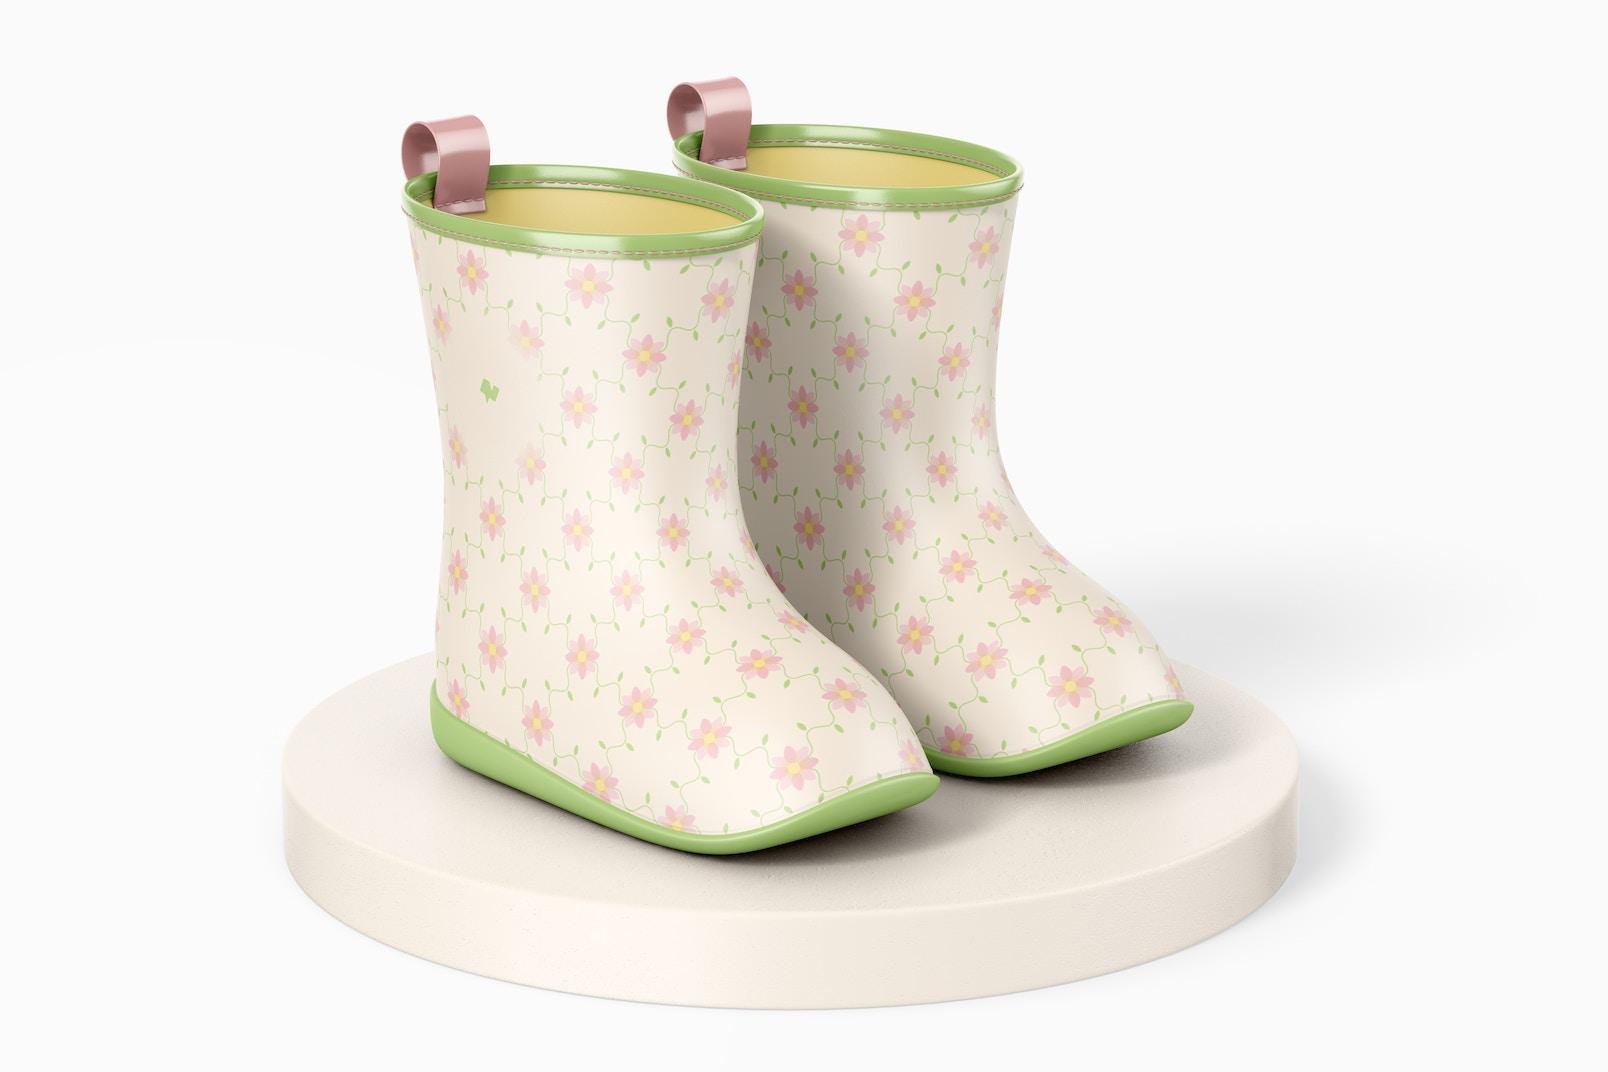 Kids Rain Boots Mockup, on Surface